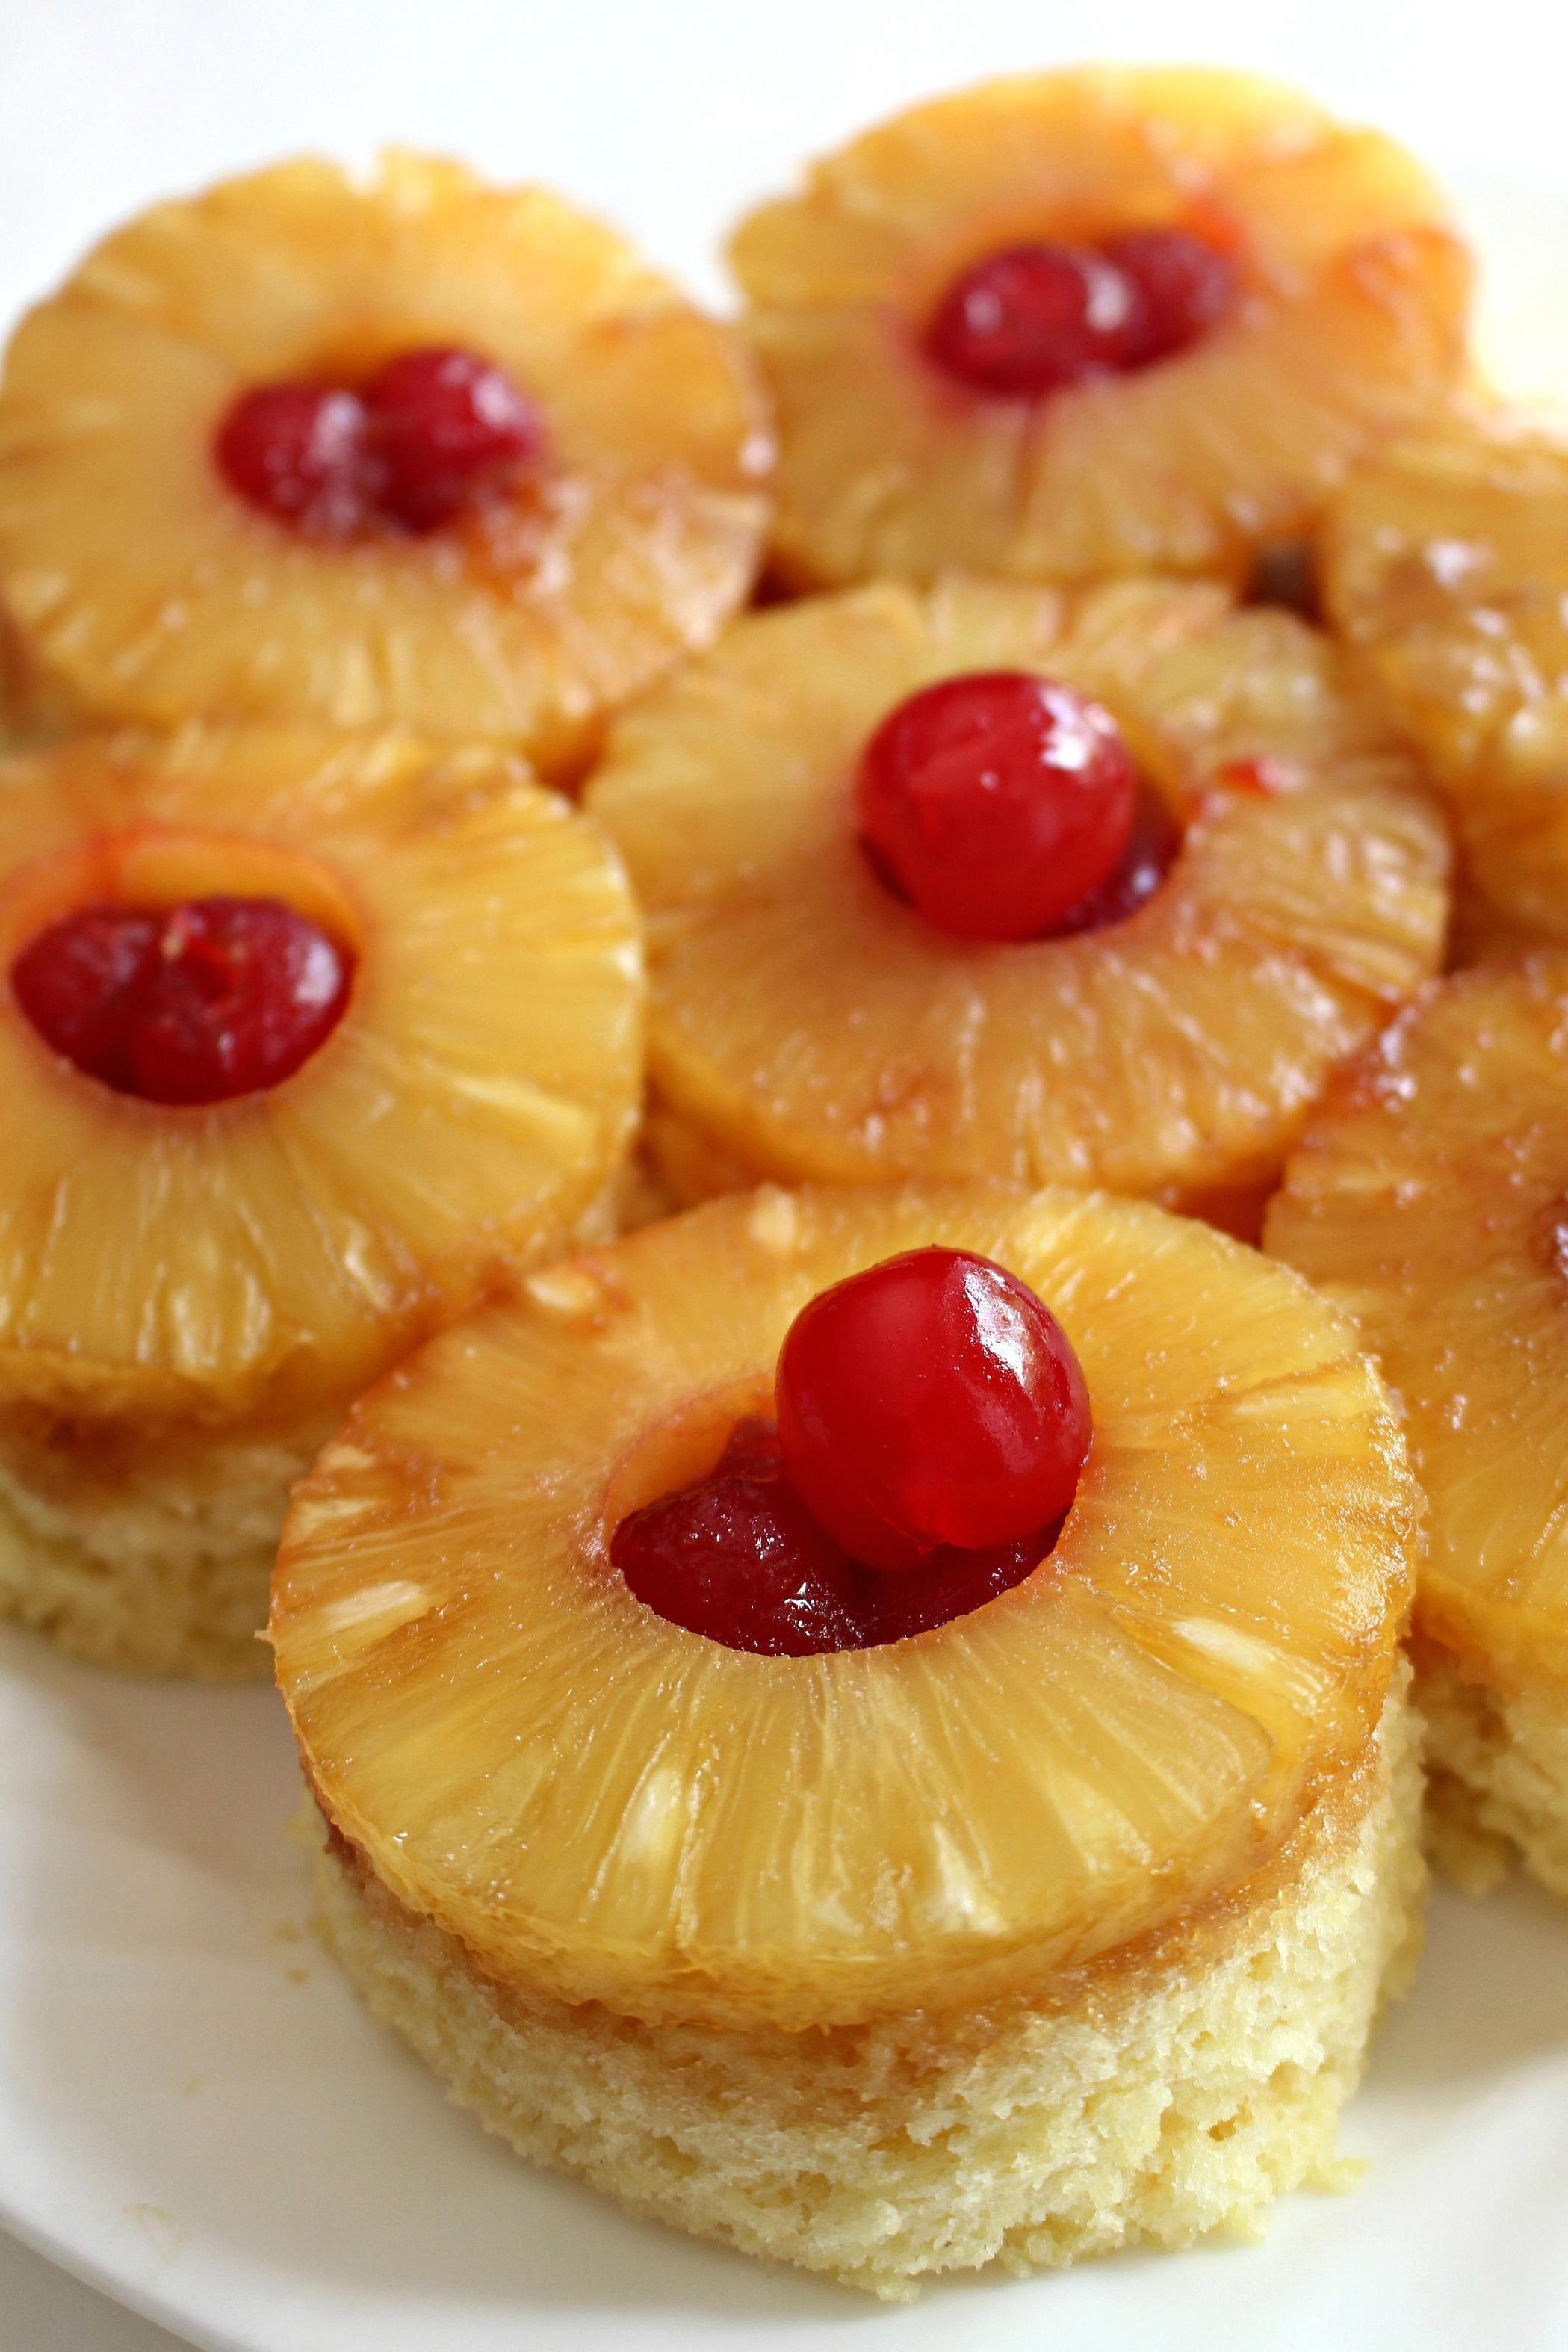 Quick Pineapple Upside Down Cake